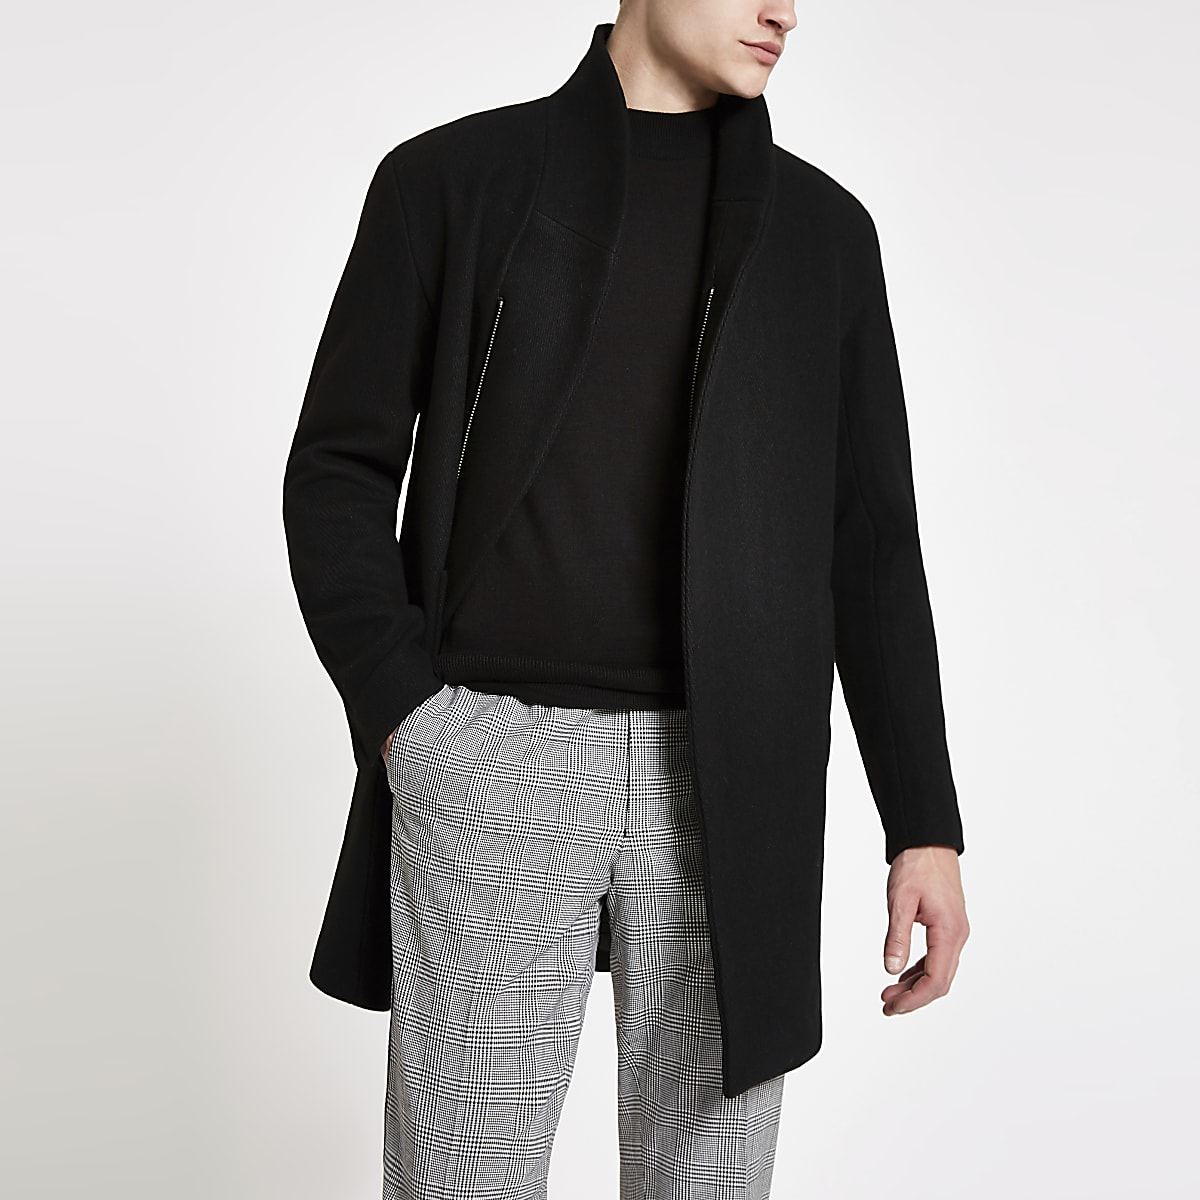 Minimum Allston - Zwarte klassieke jas